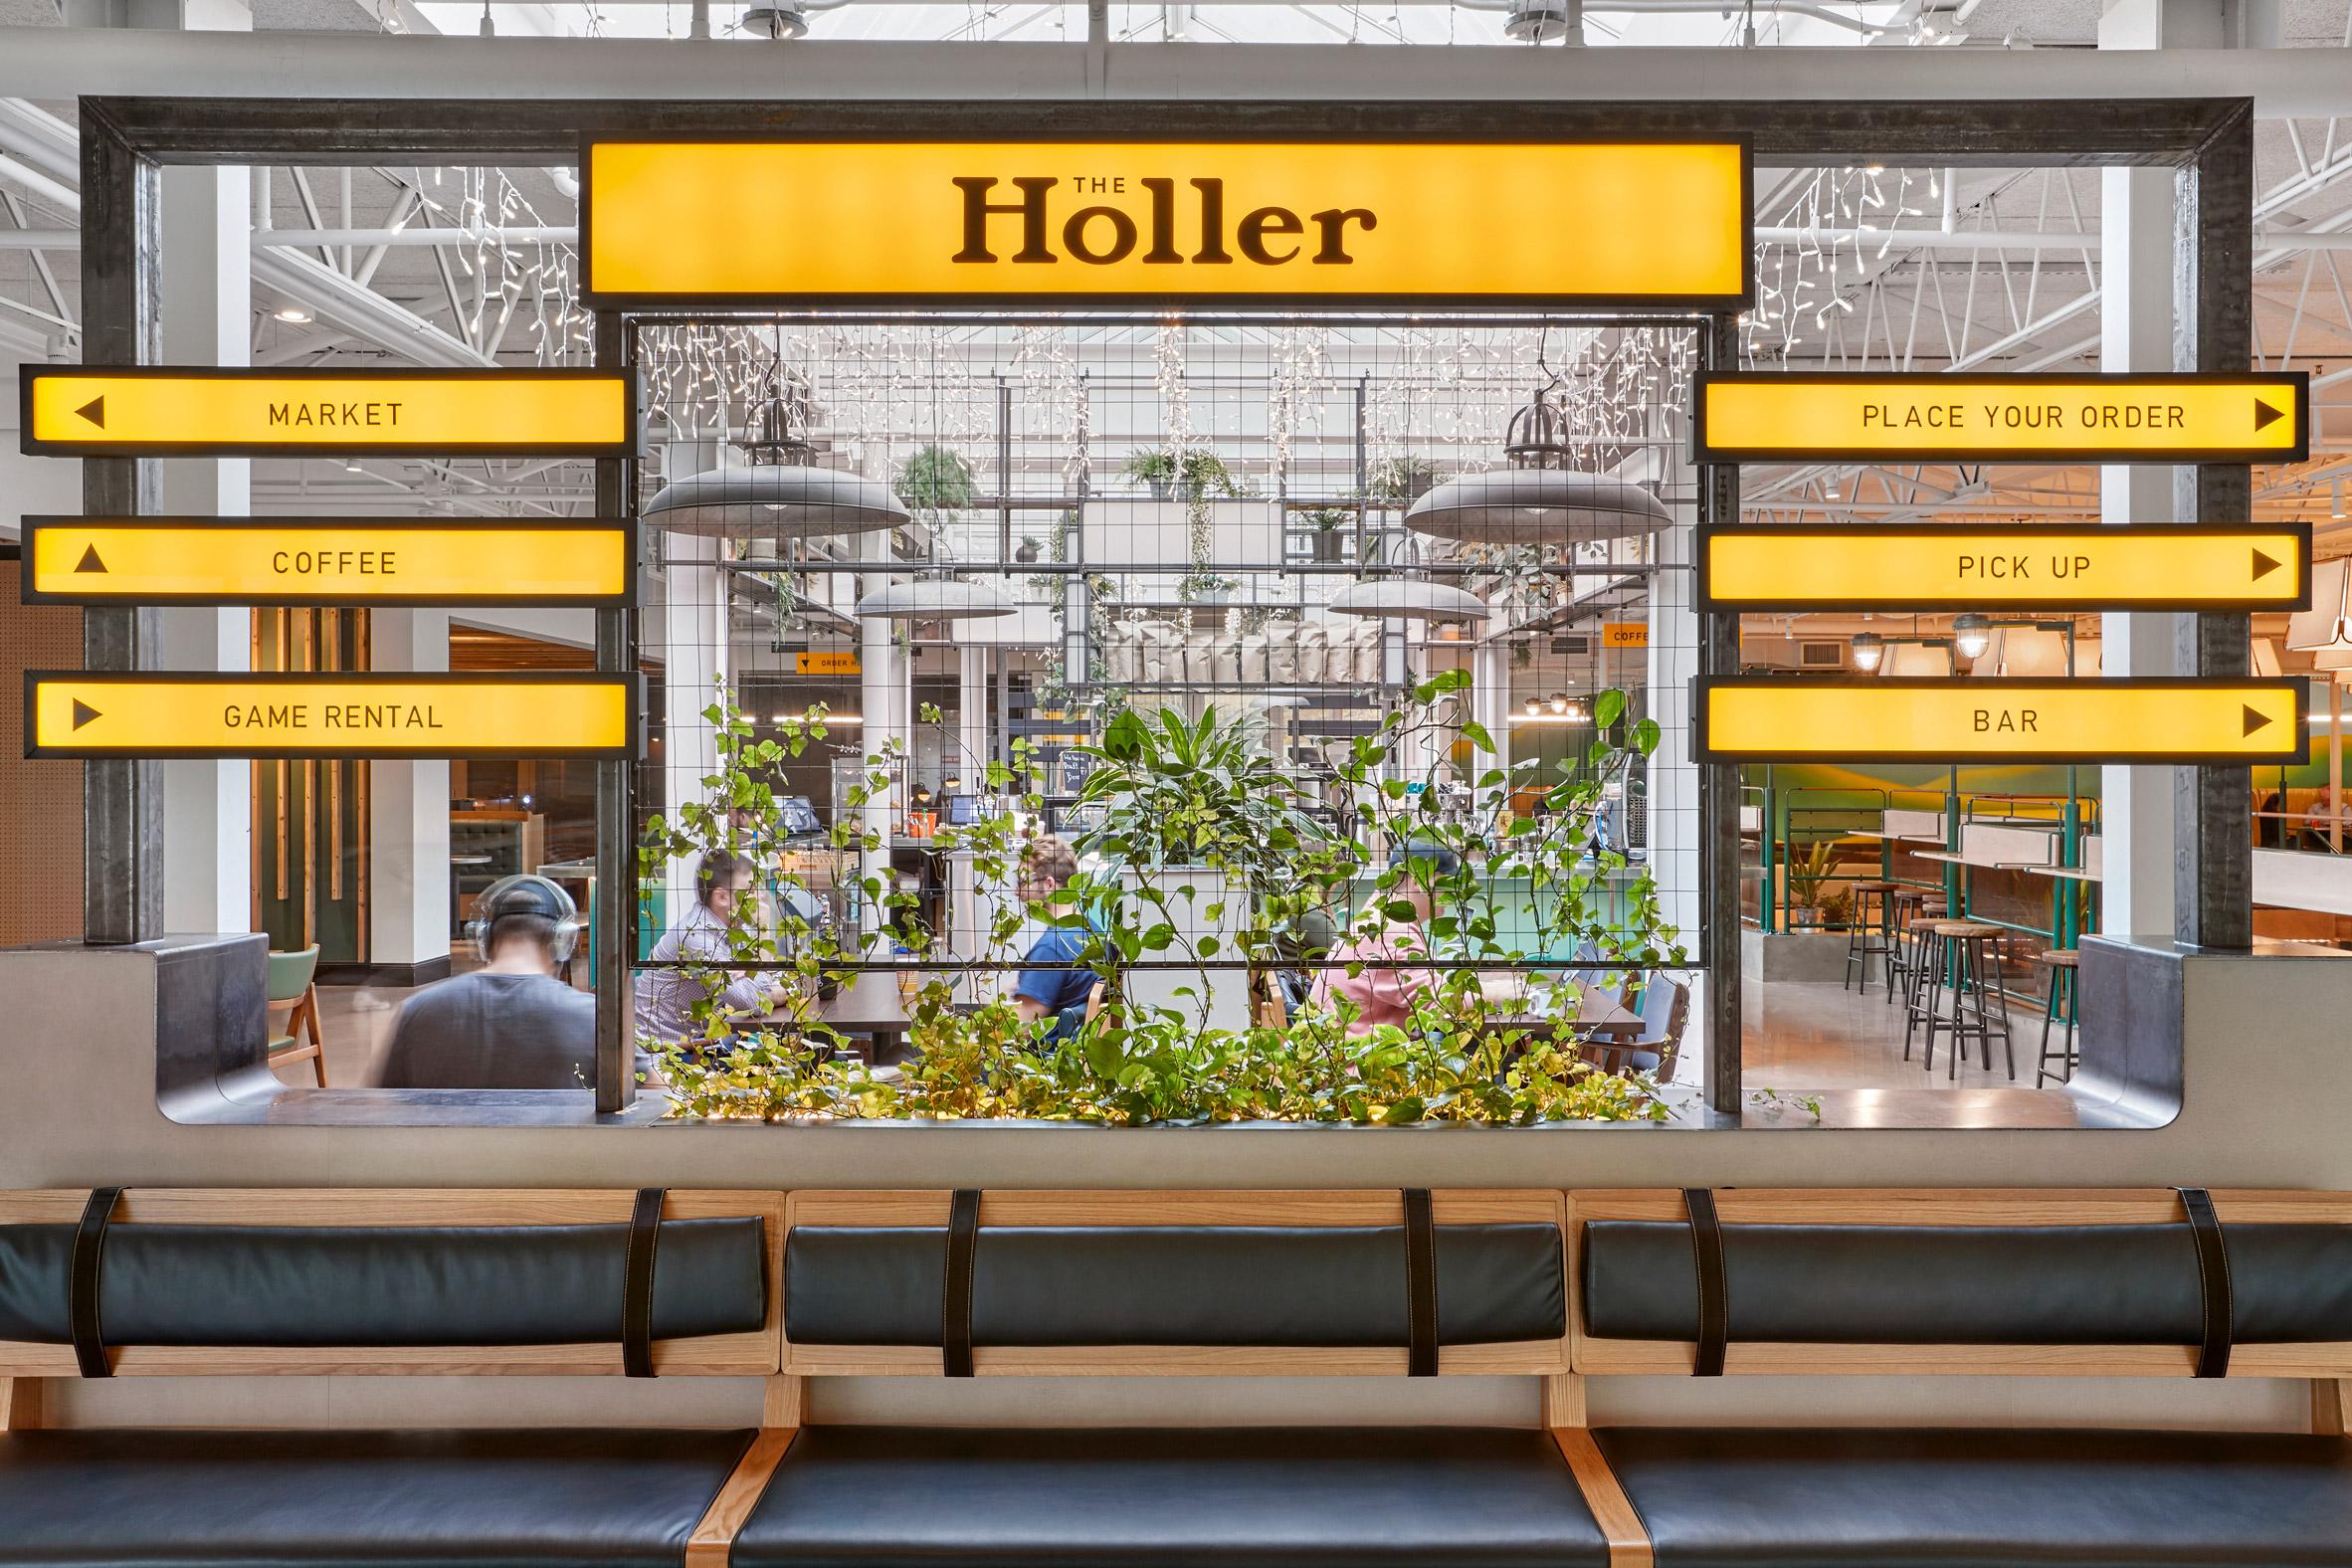 The Holler by Brand Bureau